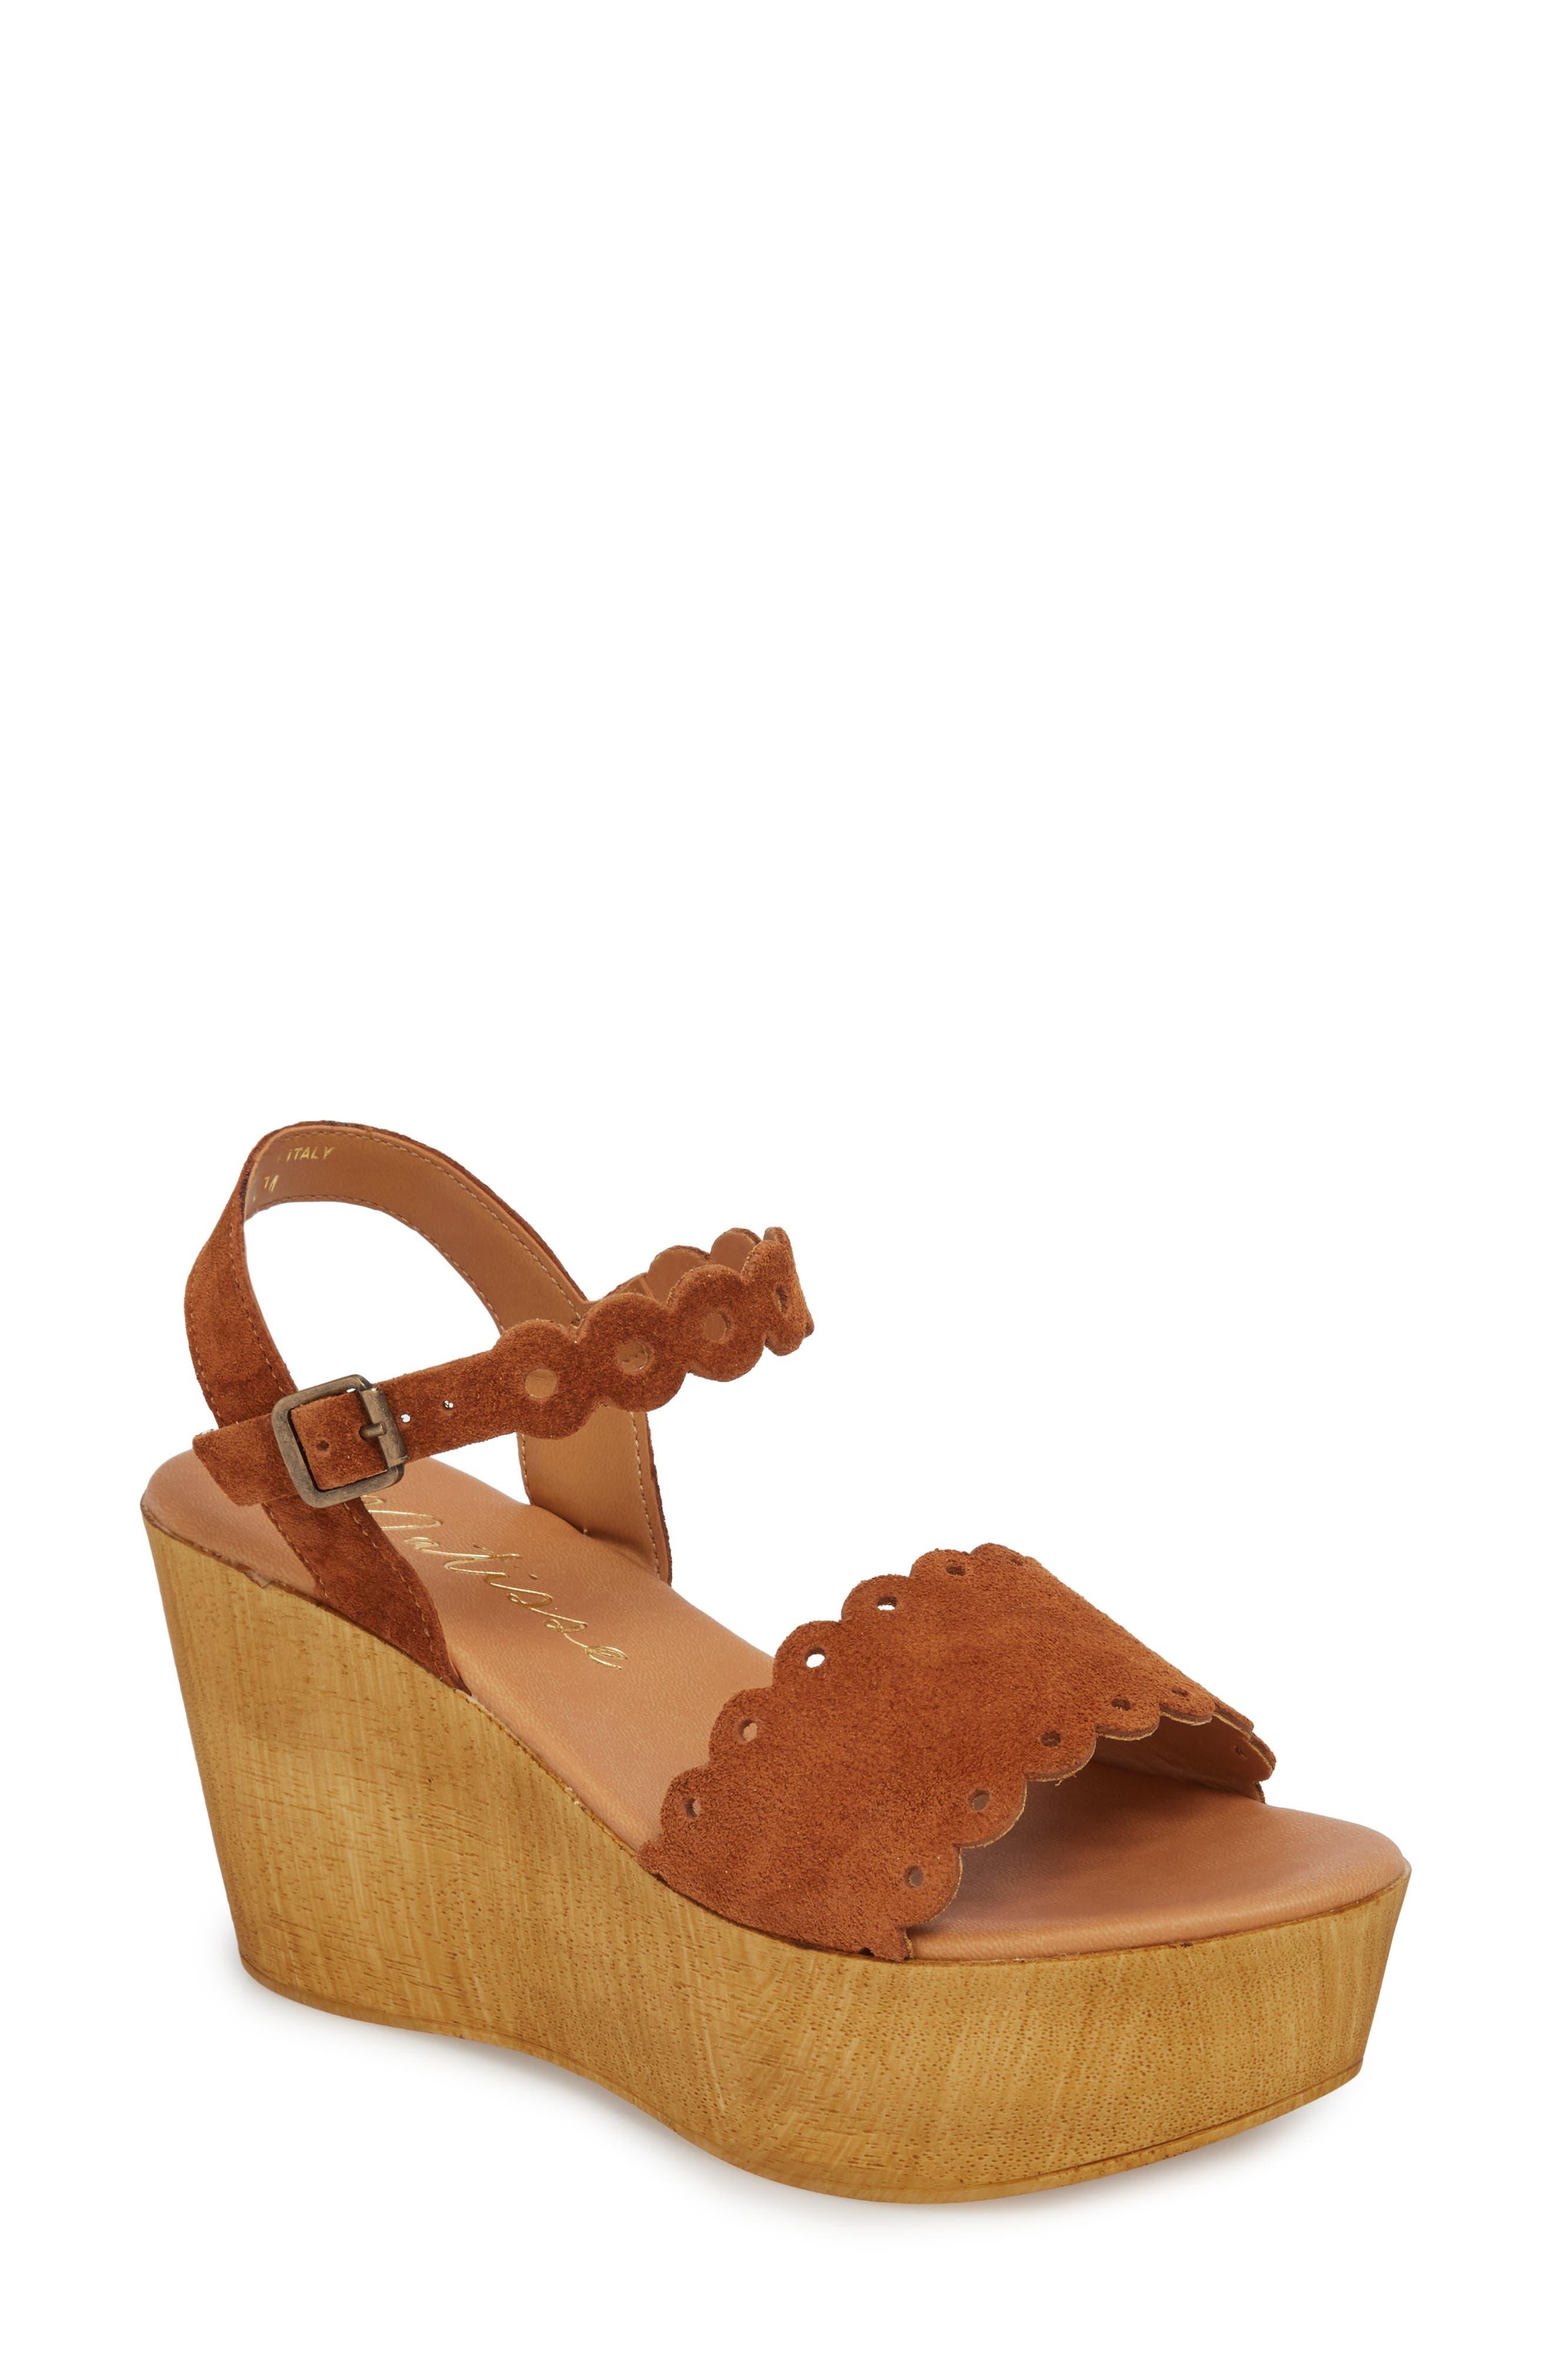 Matisse Chrysler Platform Wedge Sandal (Women)